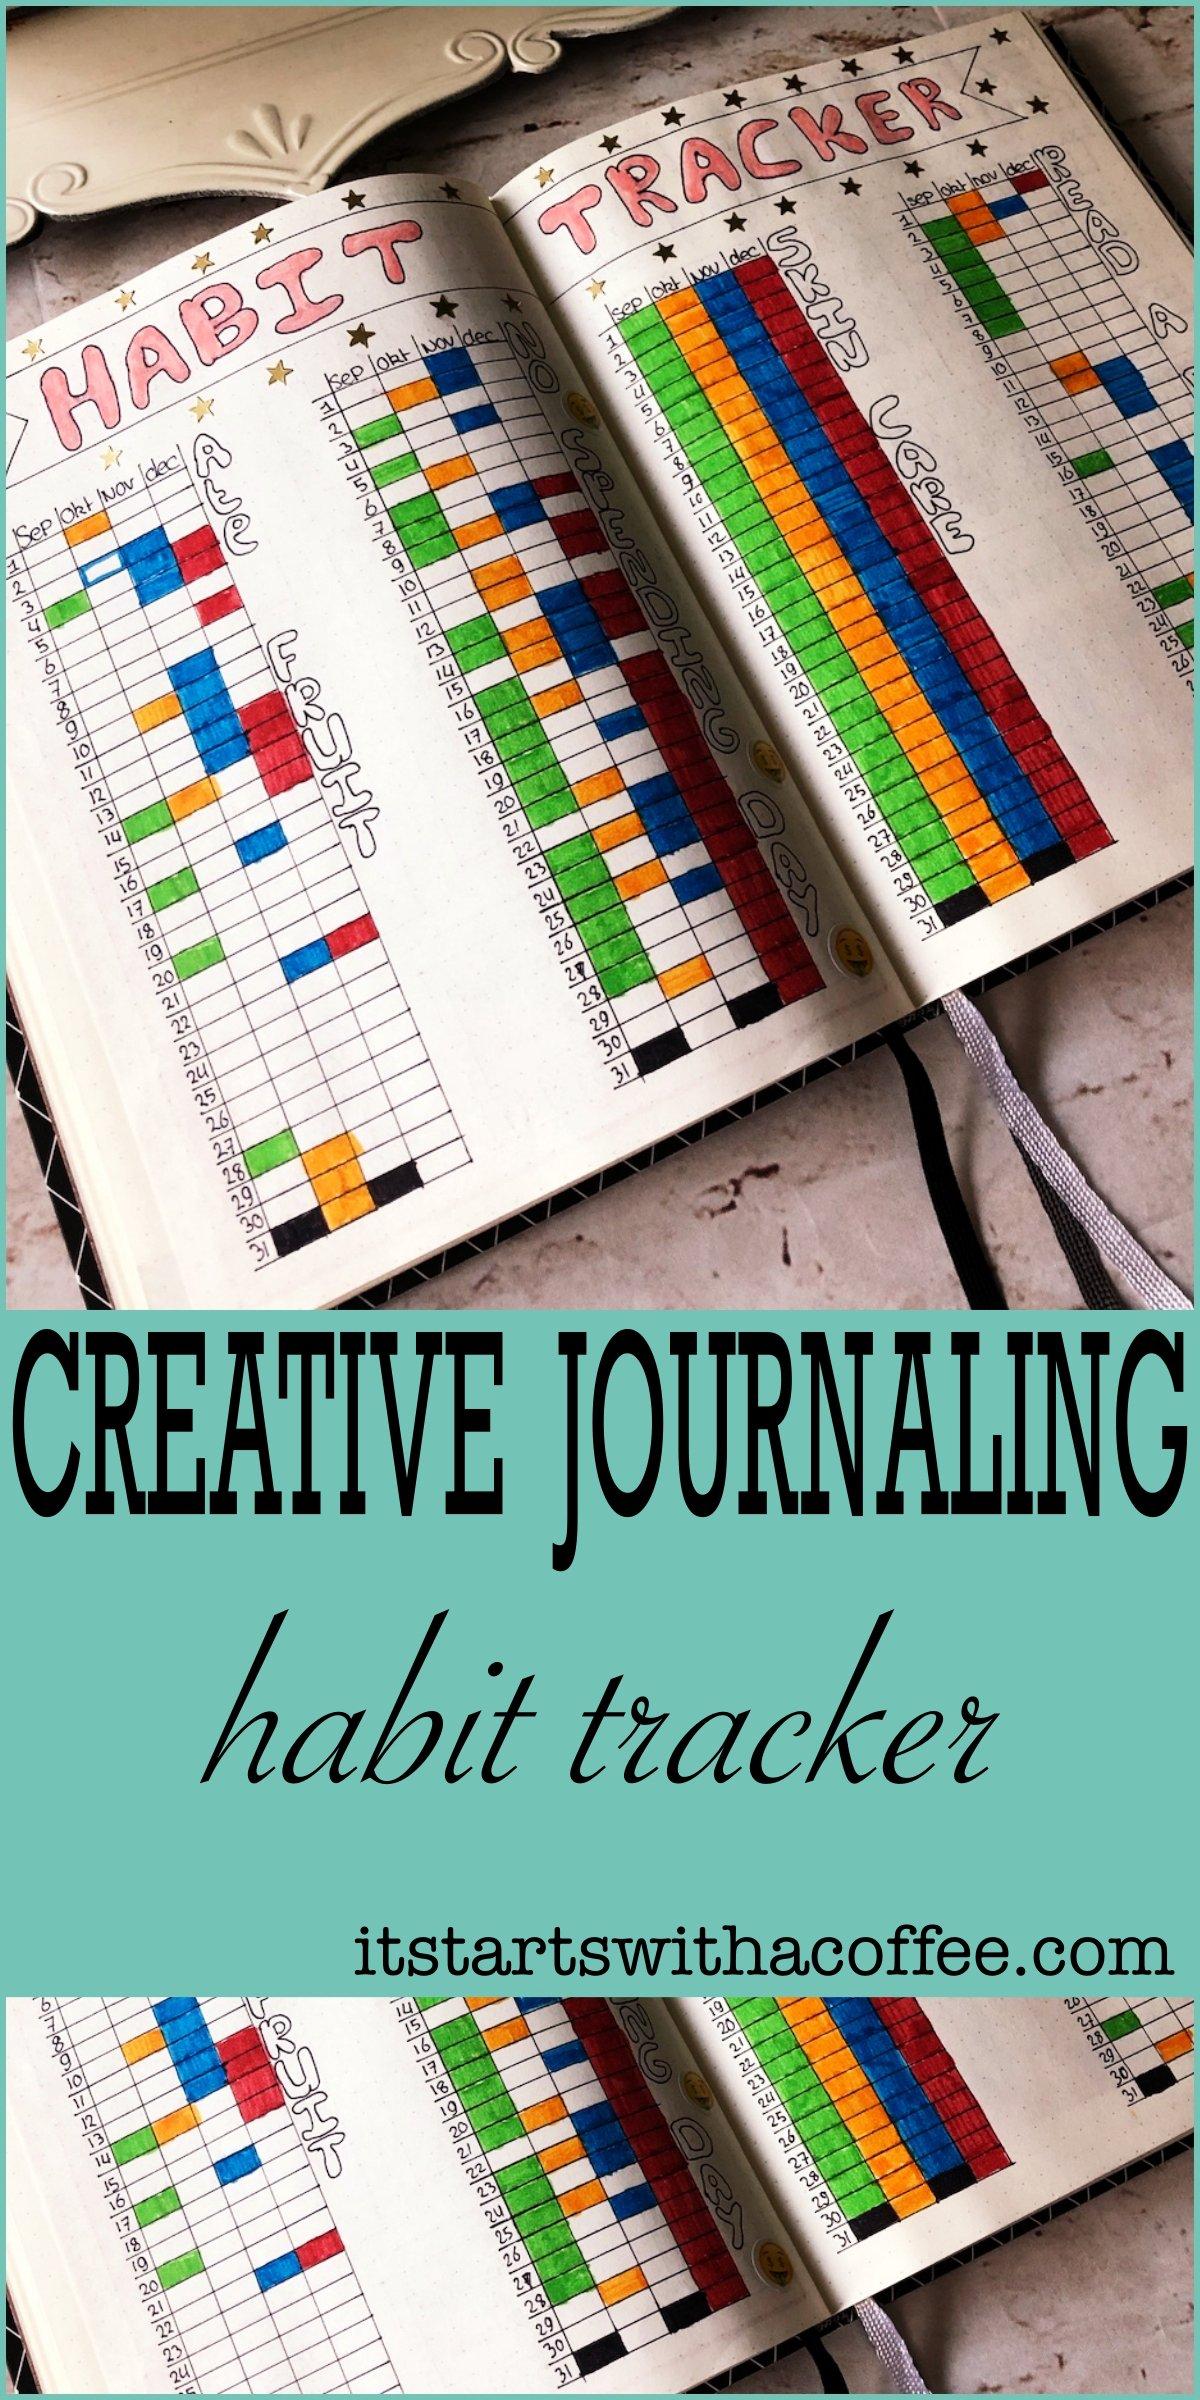 Creative journaling - habit tracker - itstartswithacoffee.com #creativejournaling #bulletjournaling #planner #habittracker #tracker